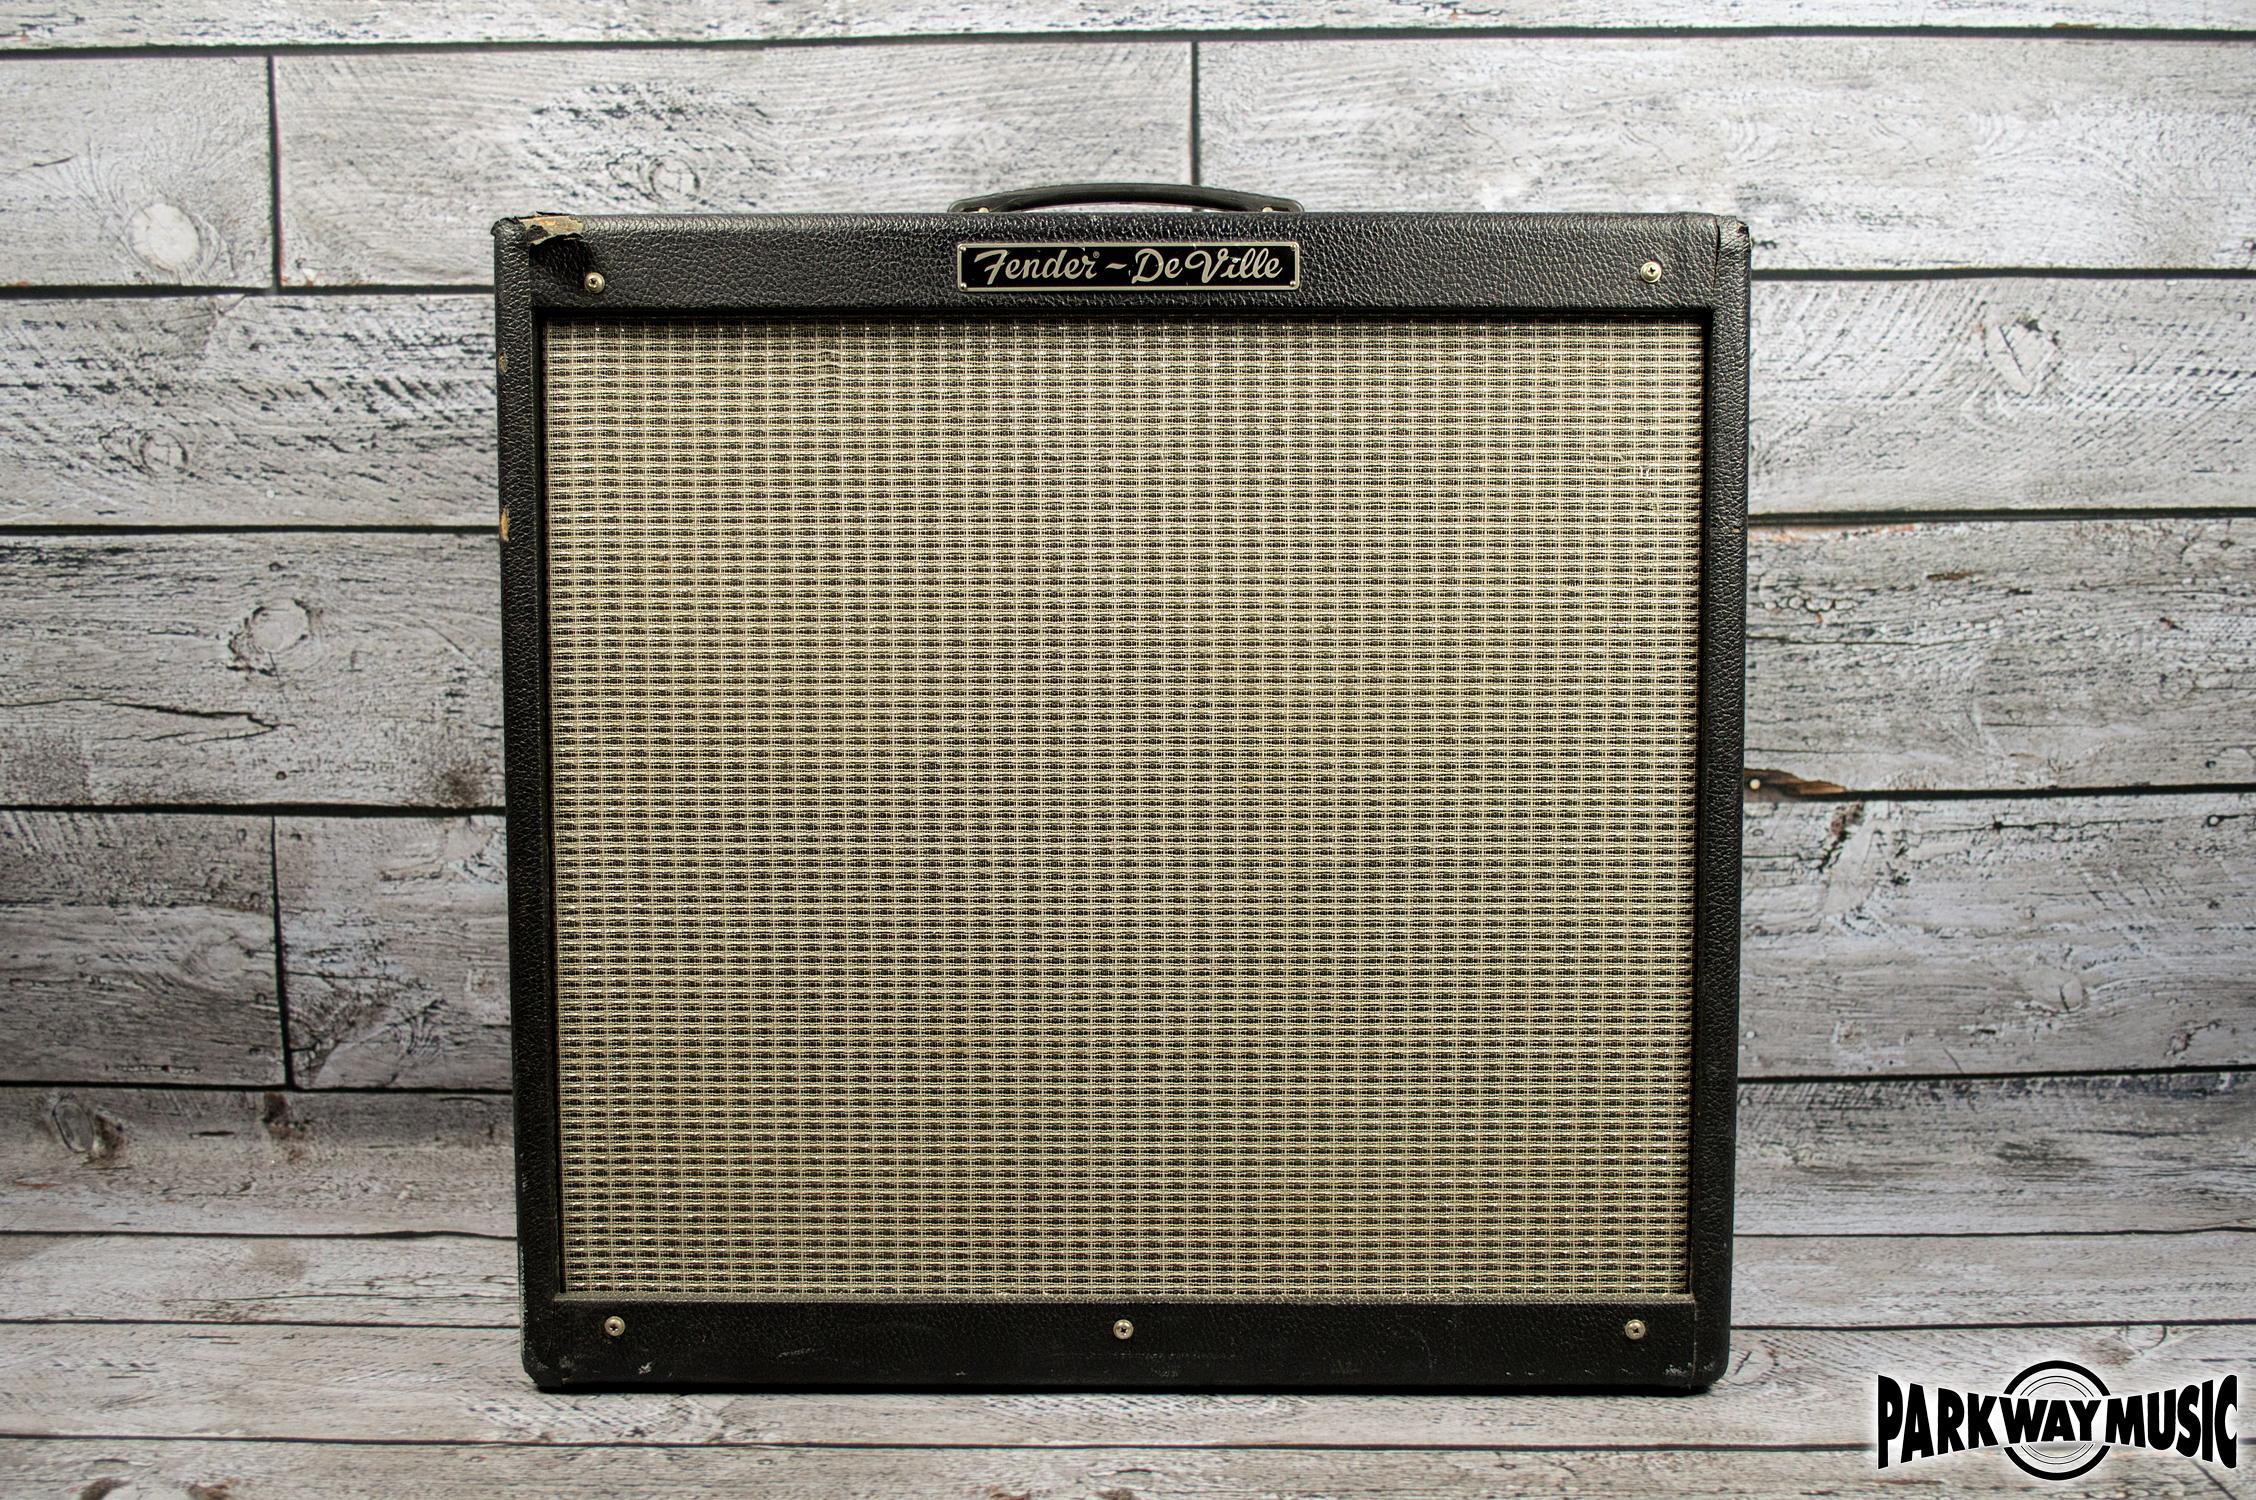 Fender Hot Rod Deville 4x10 (USED) - SOLD